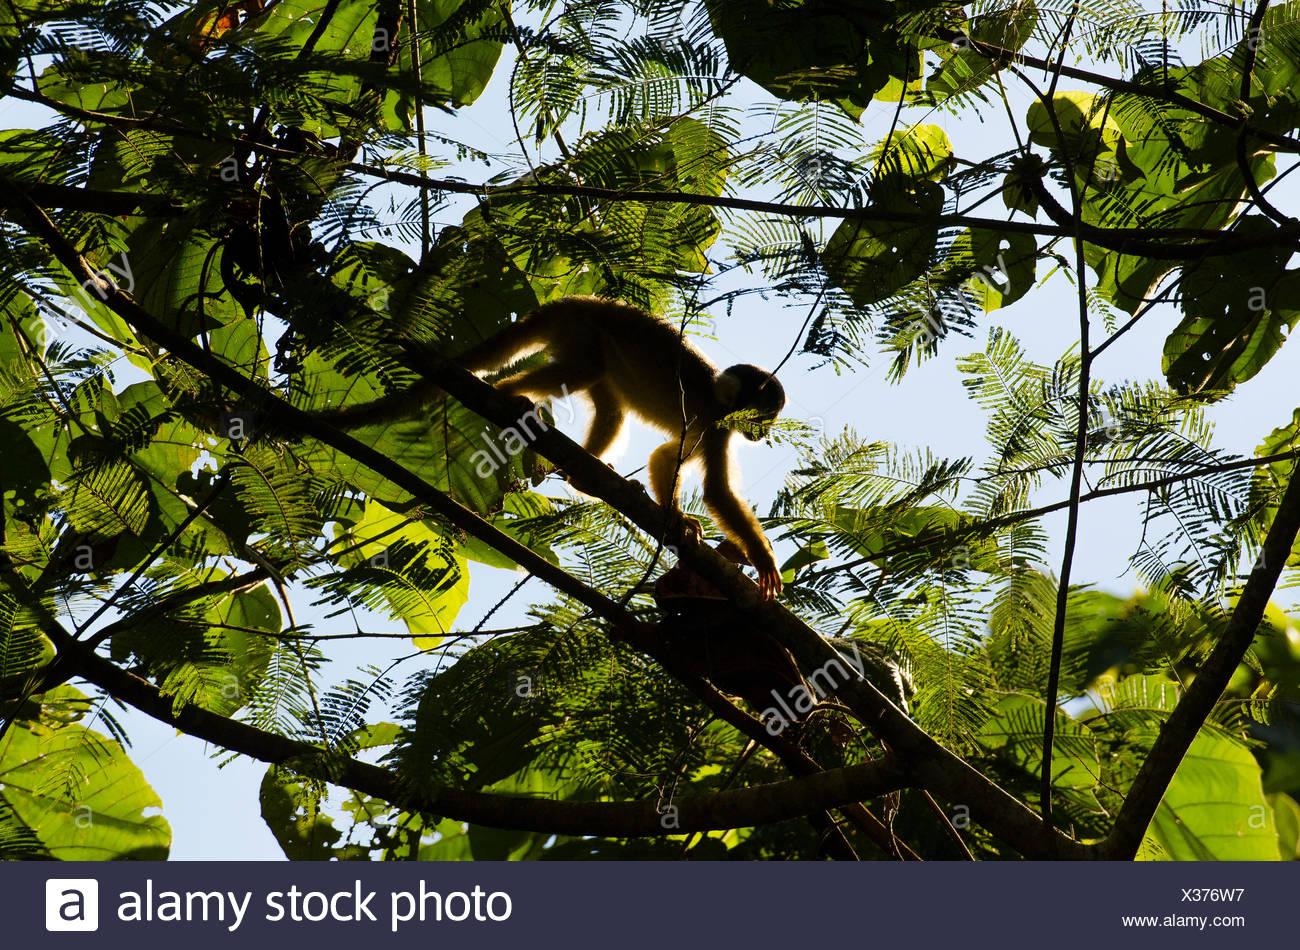 Squirrel monkeys in trees - photo#43